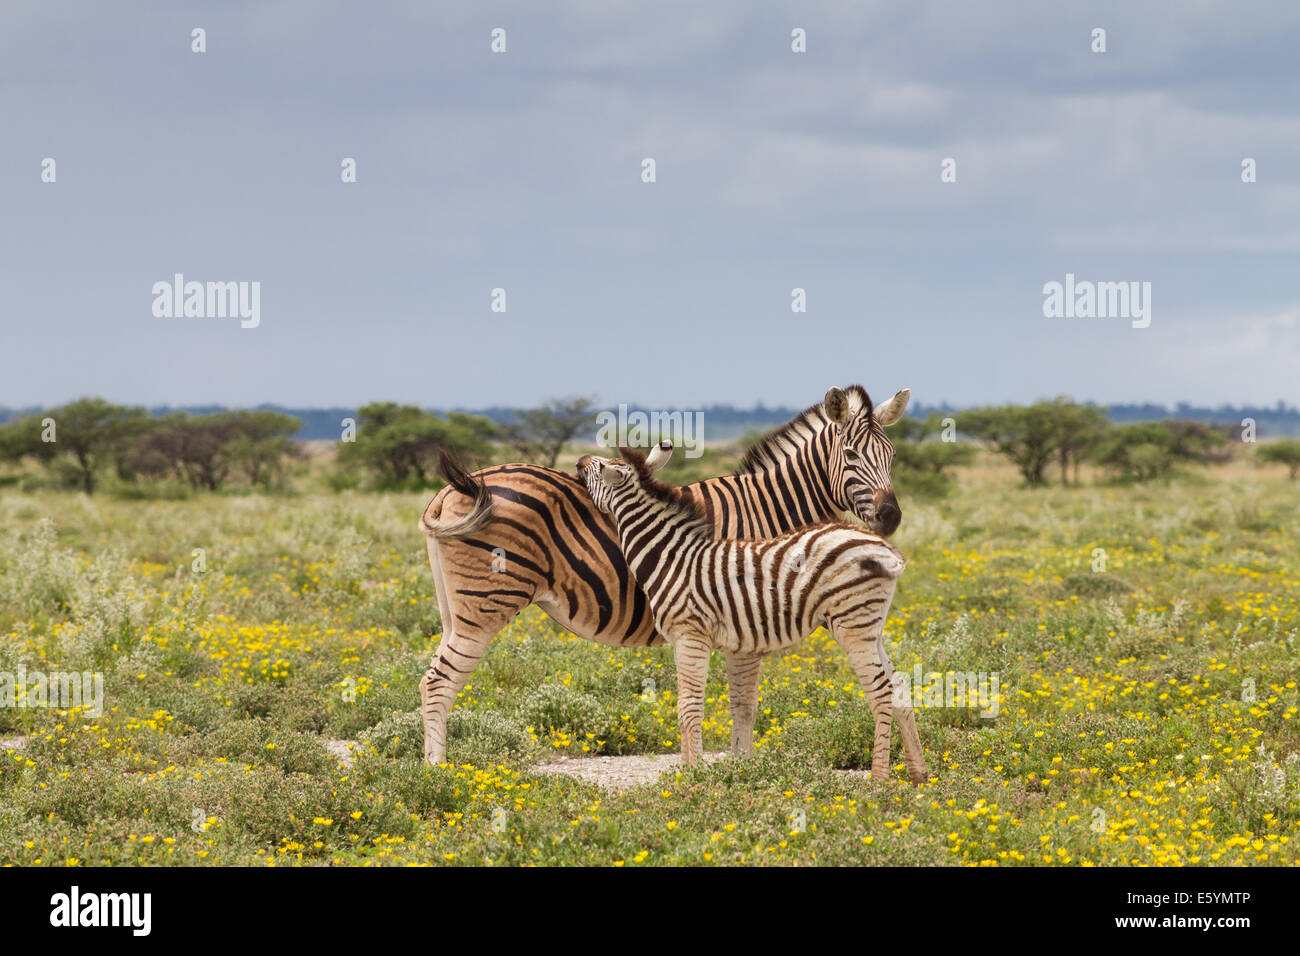 Young zebra and her mother, Etosha National Park, Namibia - Stock Image